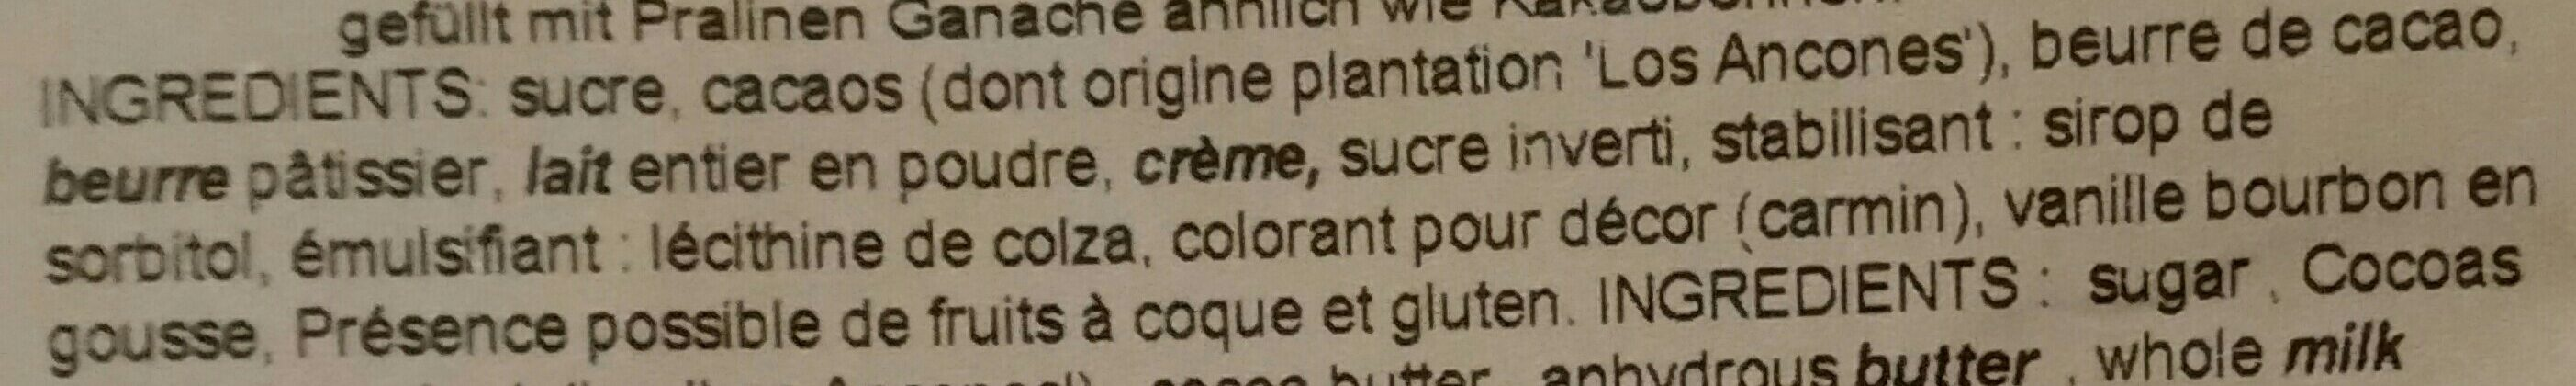 Poche Fèves De Ganache - Ingrediënten - fr